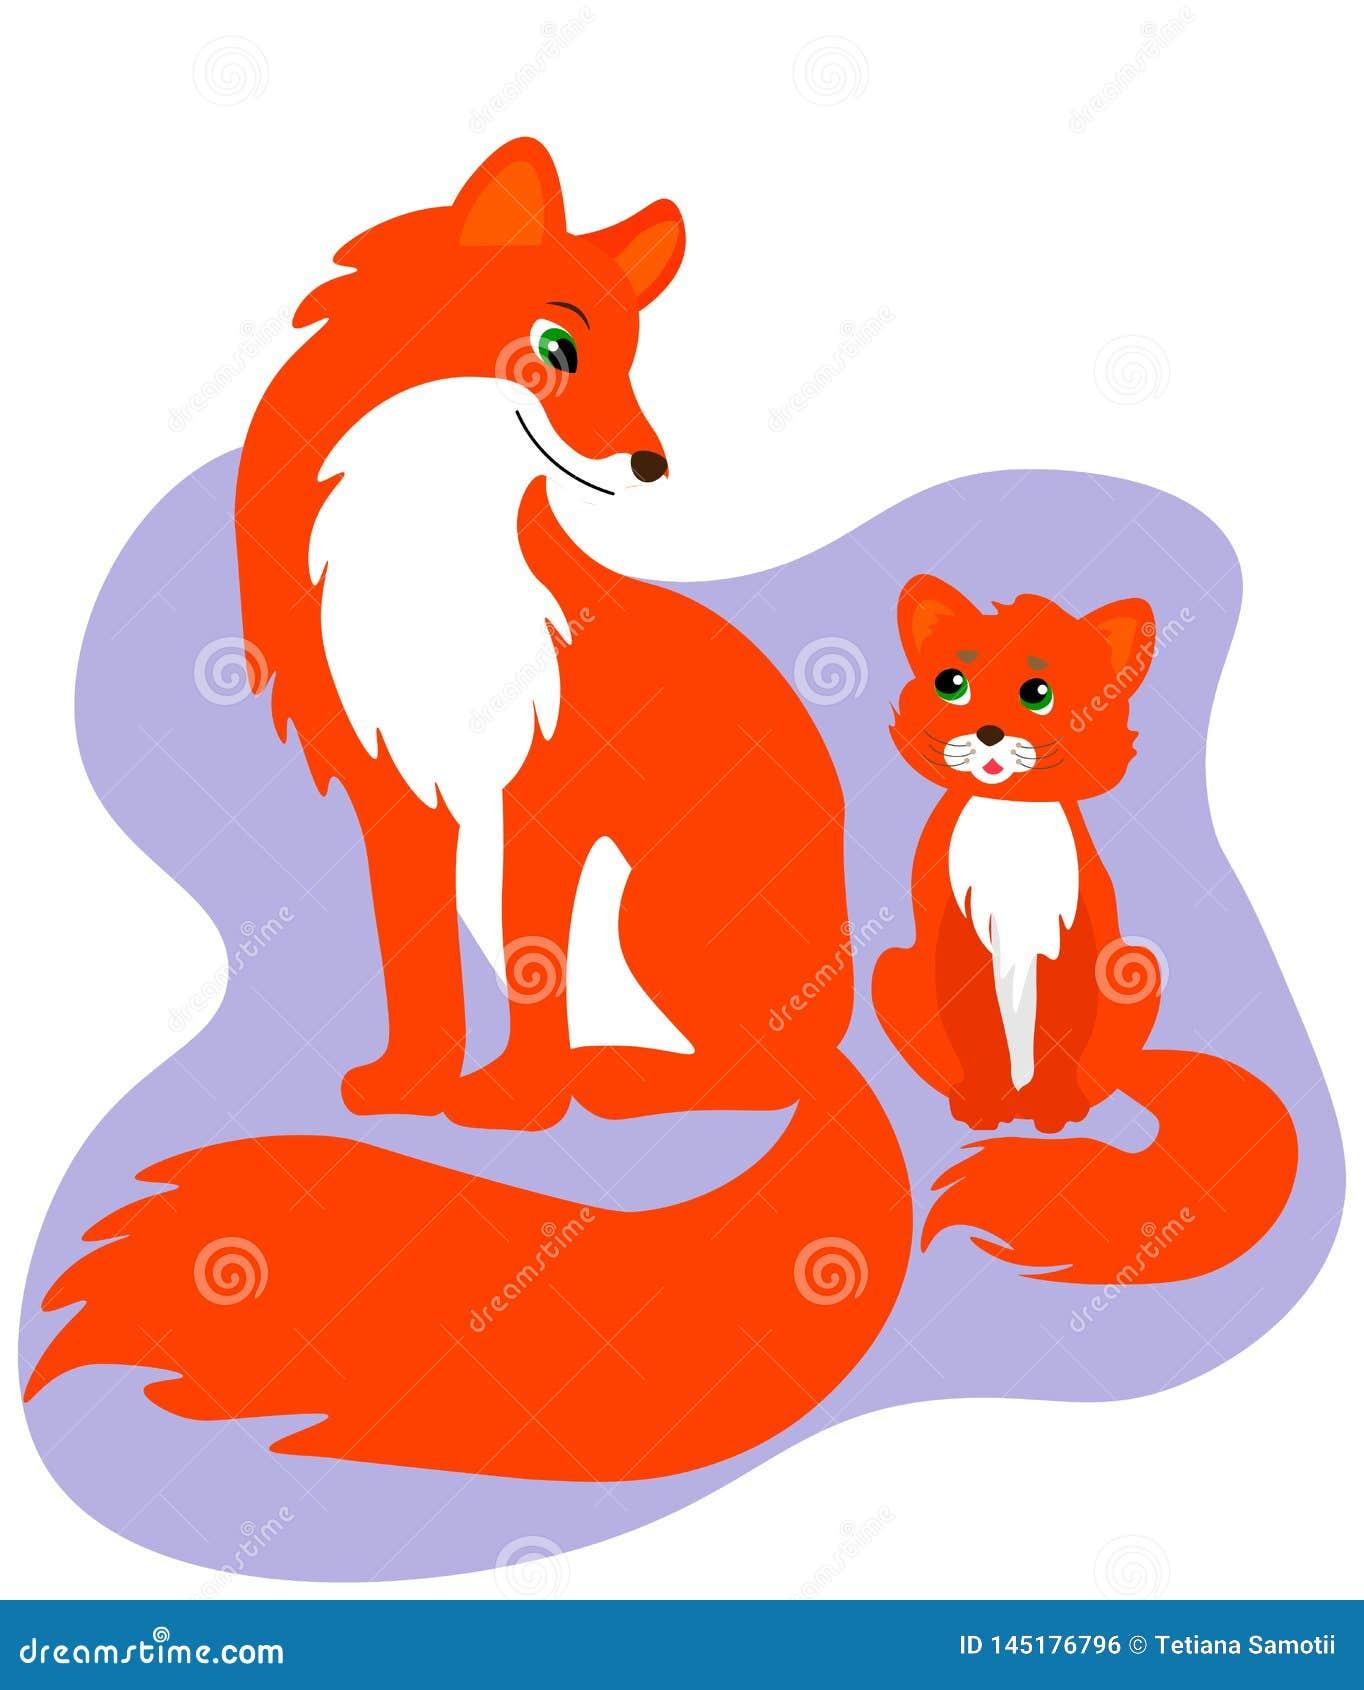 Gelukkige familiekaart Leuke vossenfamilie